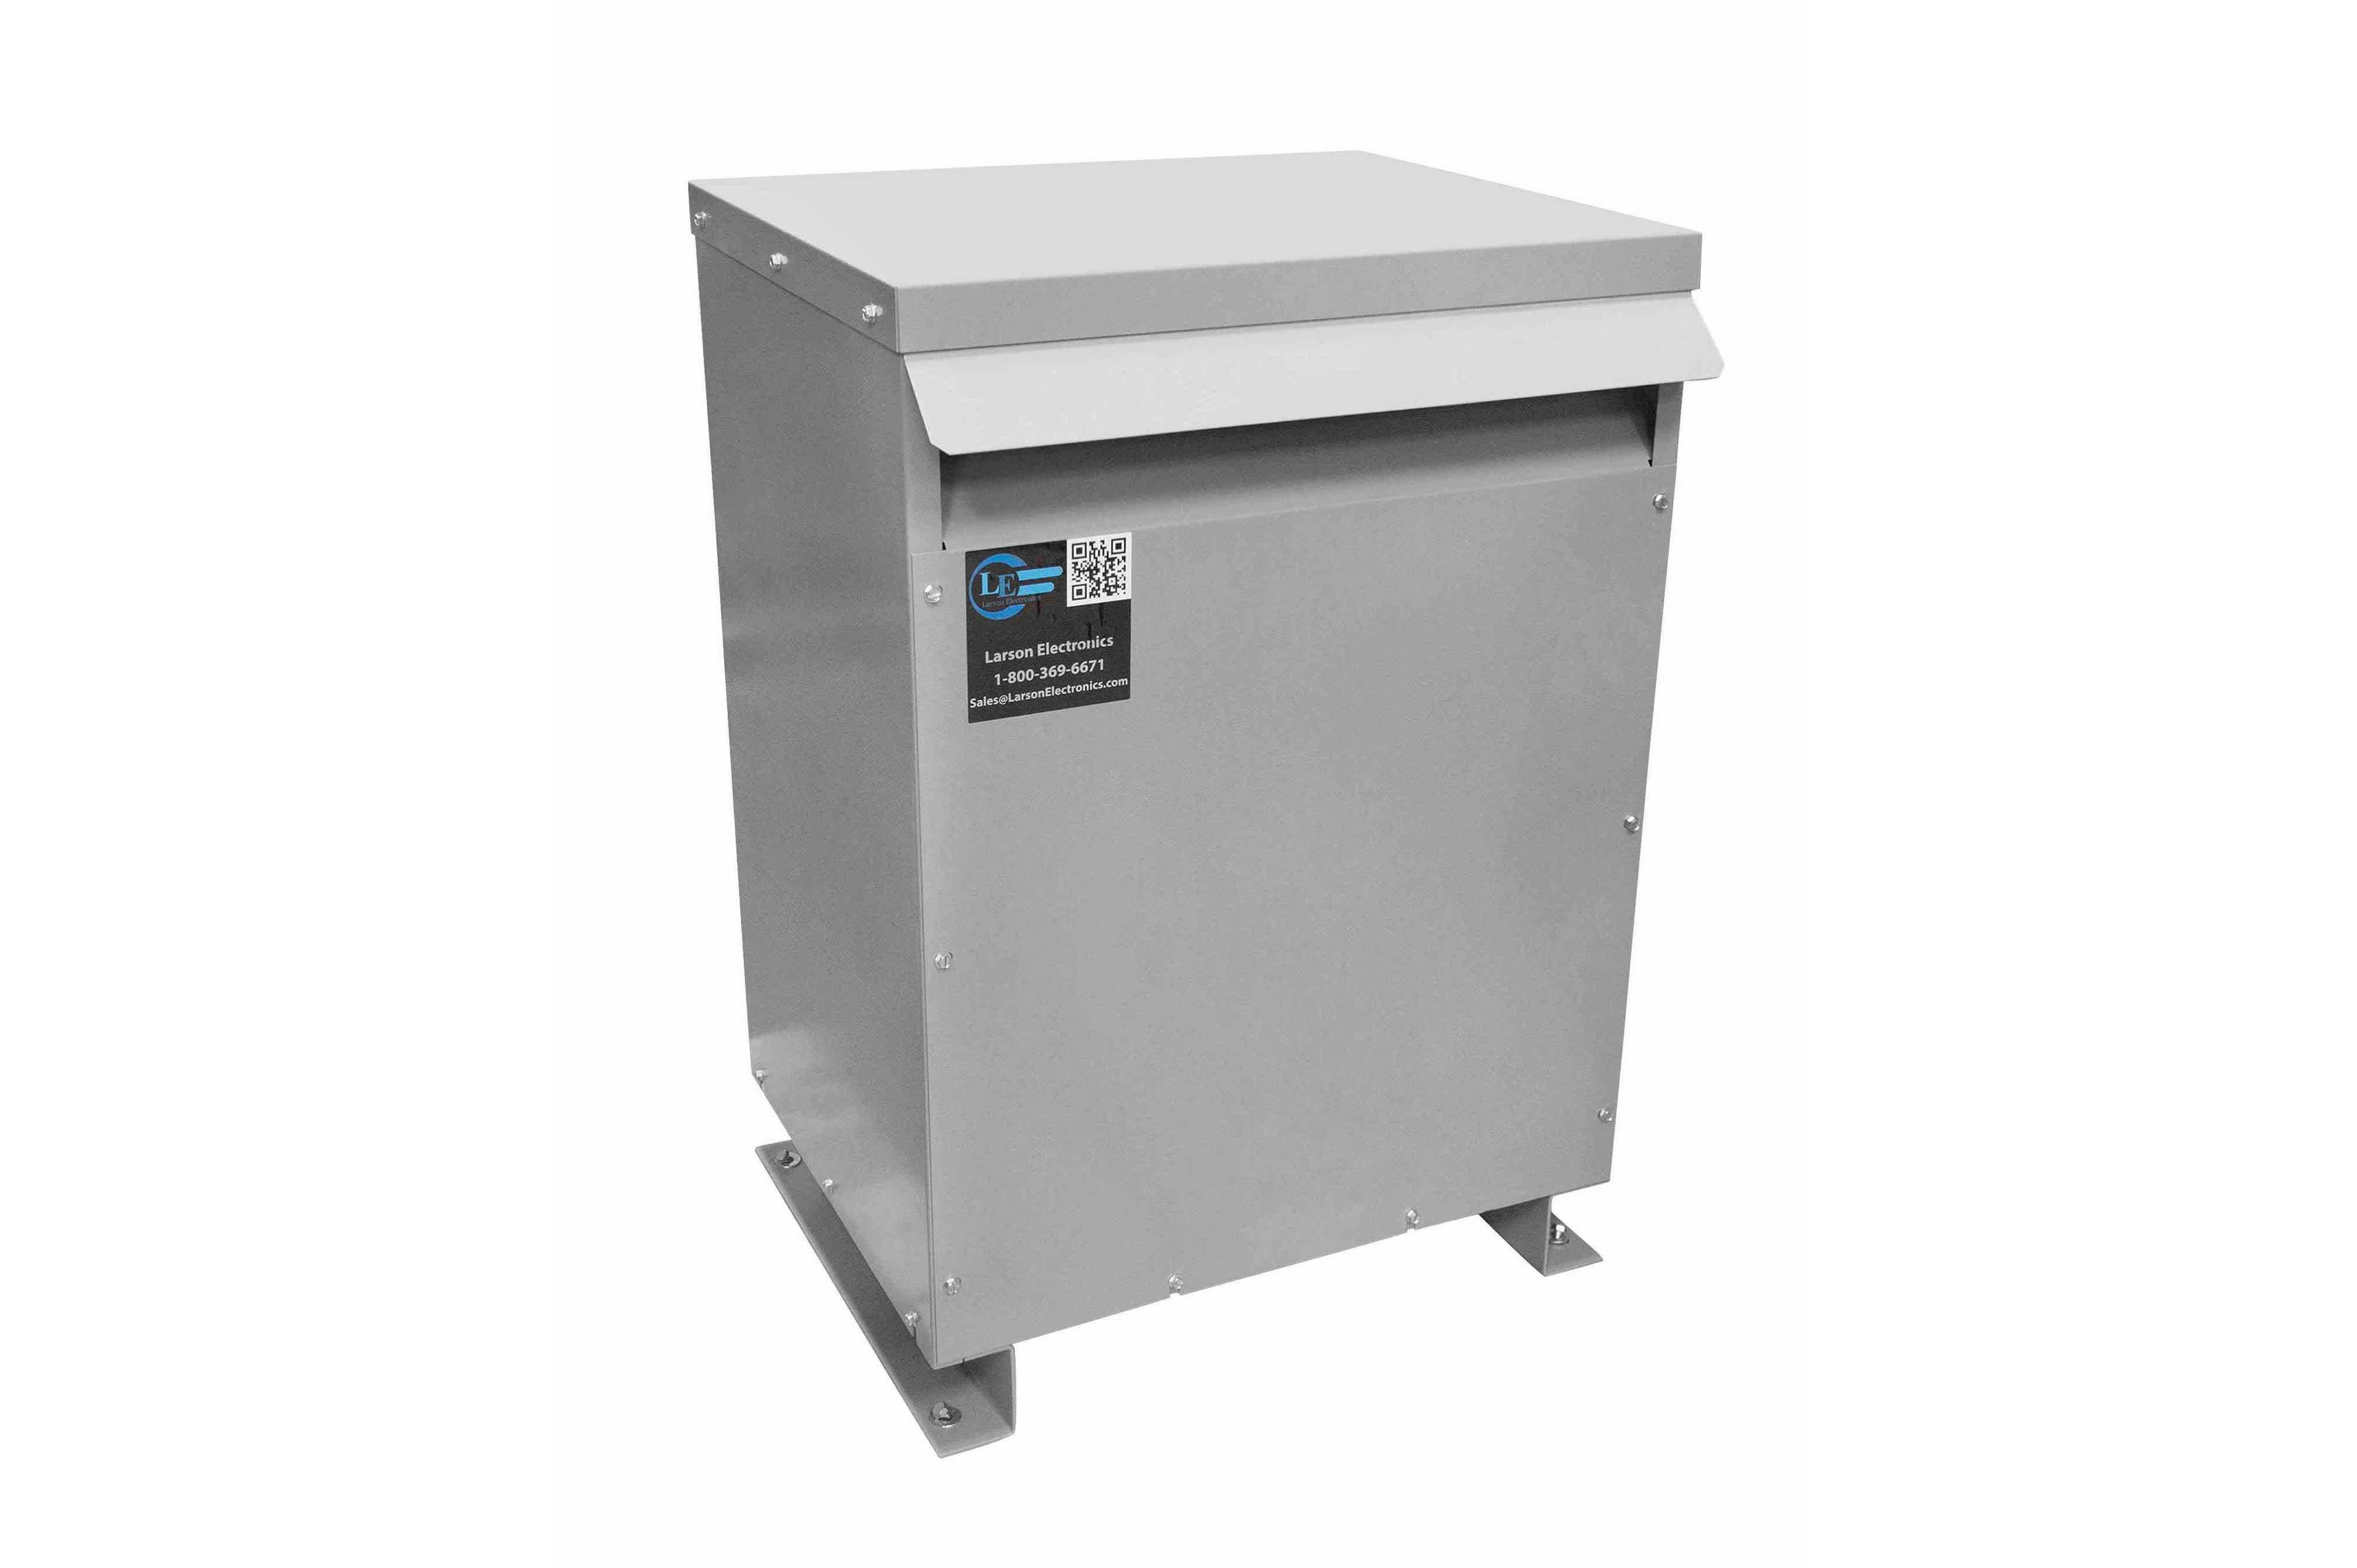 65 kVA 3PH Isolation Transformer, 480V Wye Primary, 575V Delta Secondary, N3R, Ventilated, 60 Hz